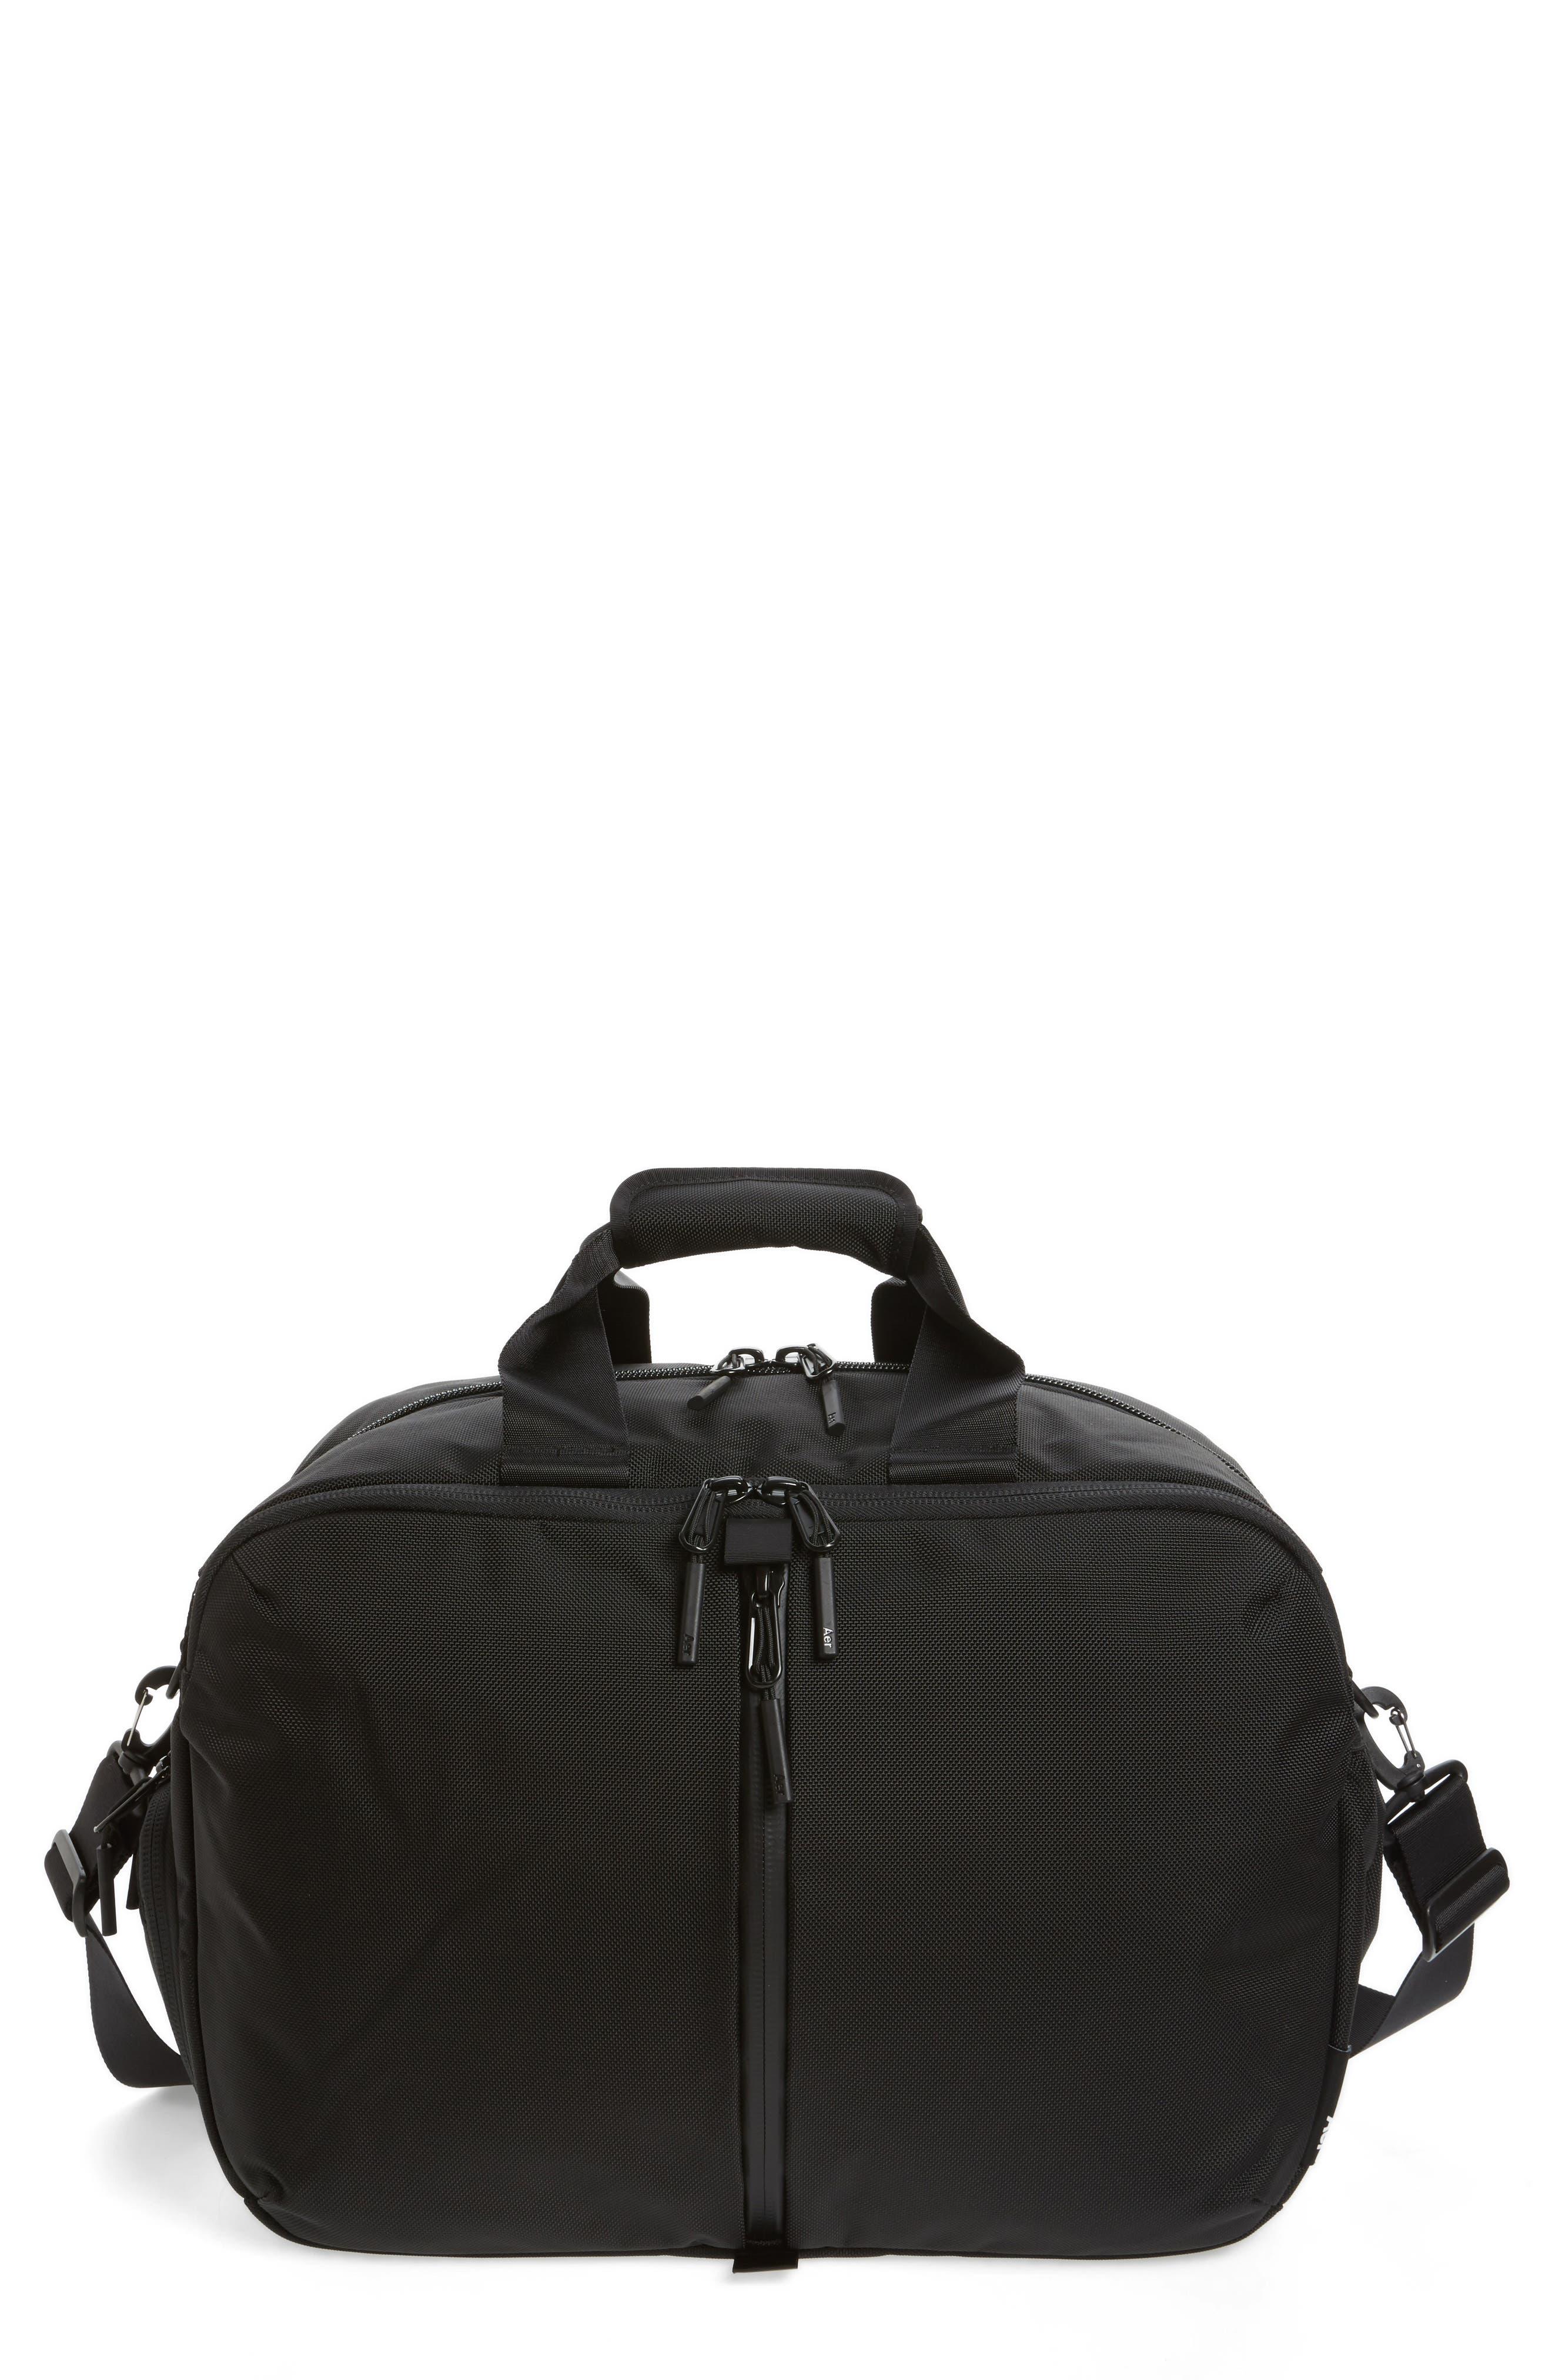 Gym Duffel 2 Bag,                         Main,                         color, Black